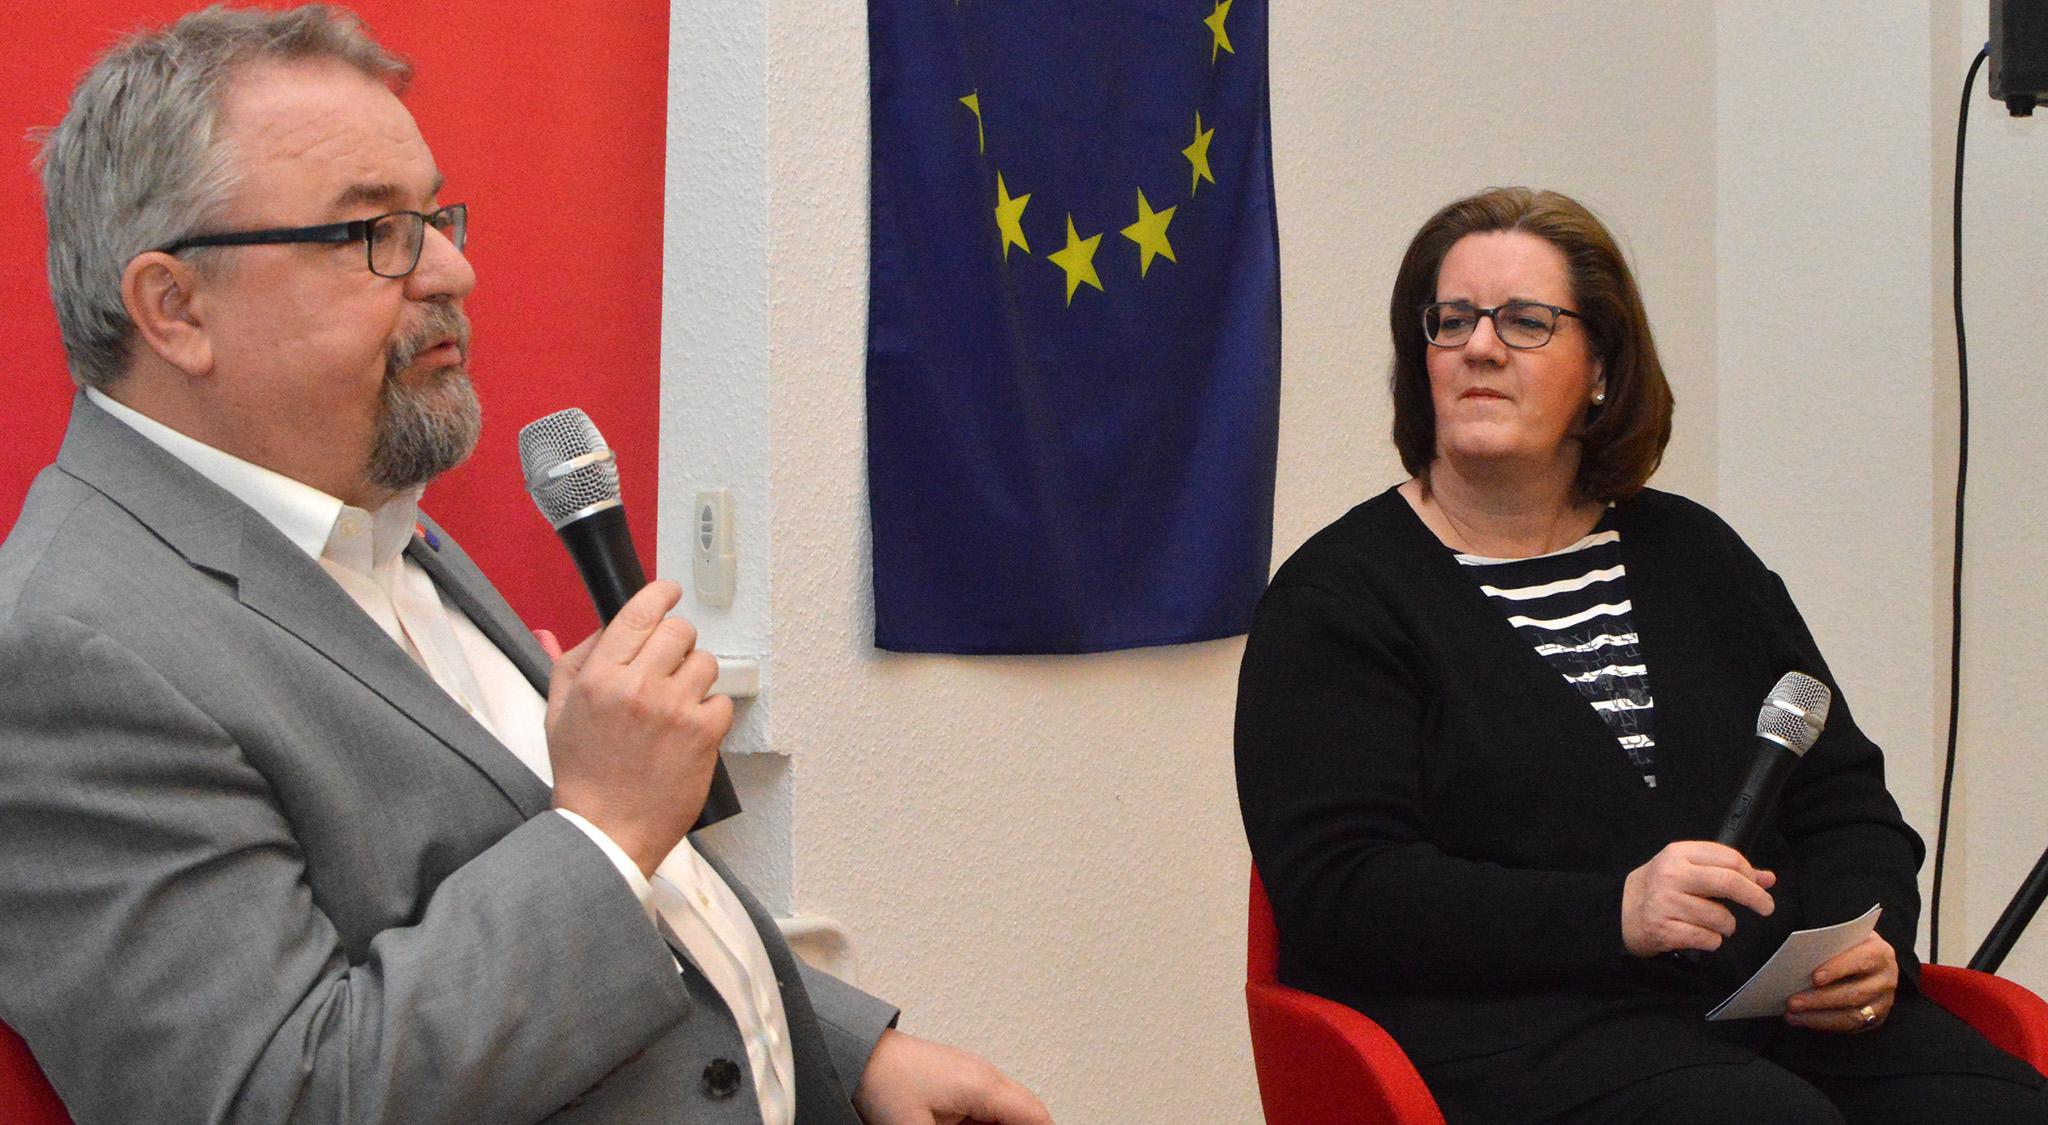 Jens Geier, Kerstin Griese